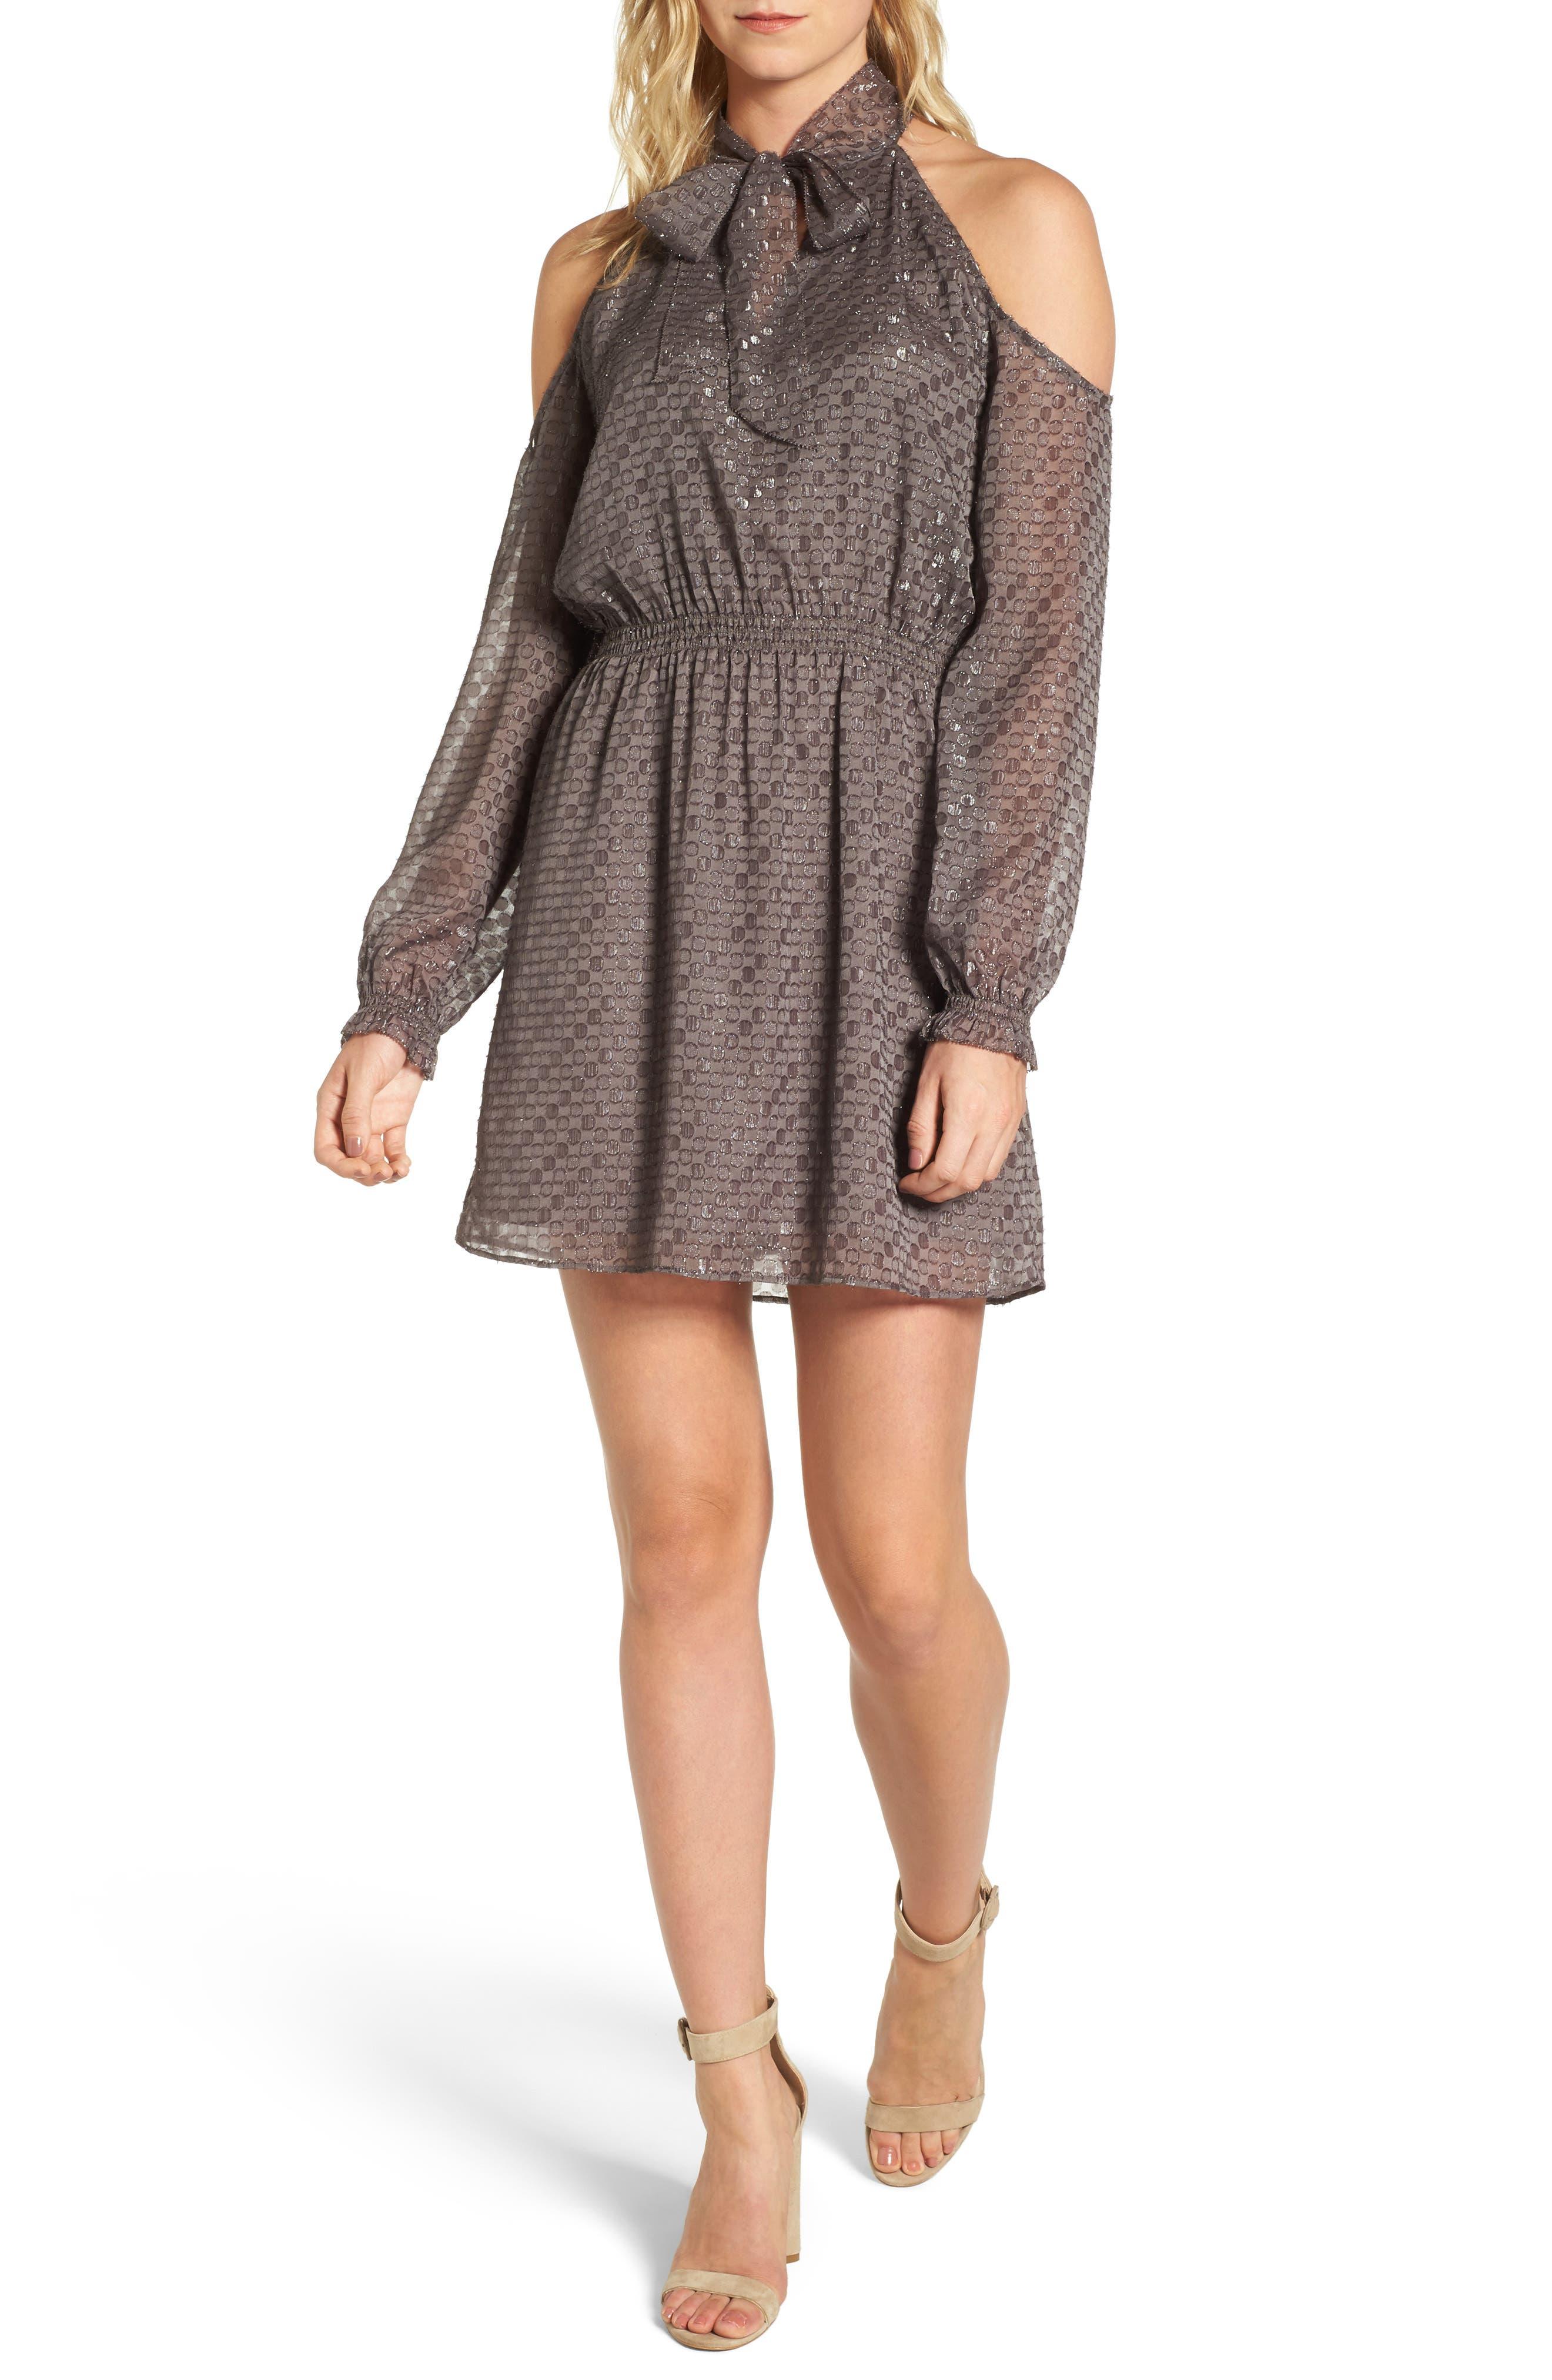 Alternate Image 1 Selected - cooper & ella Cornelia Blouson Dress